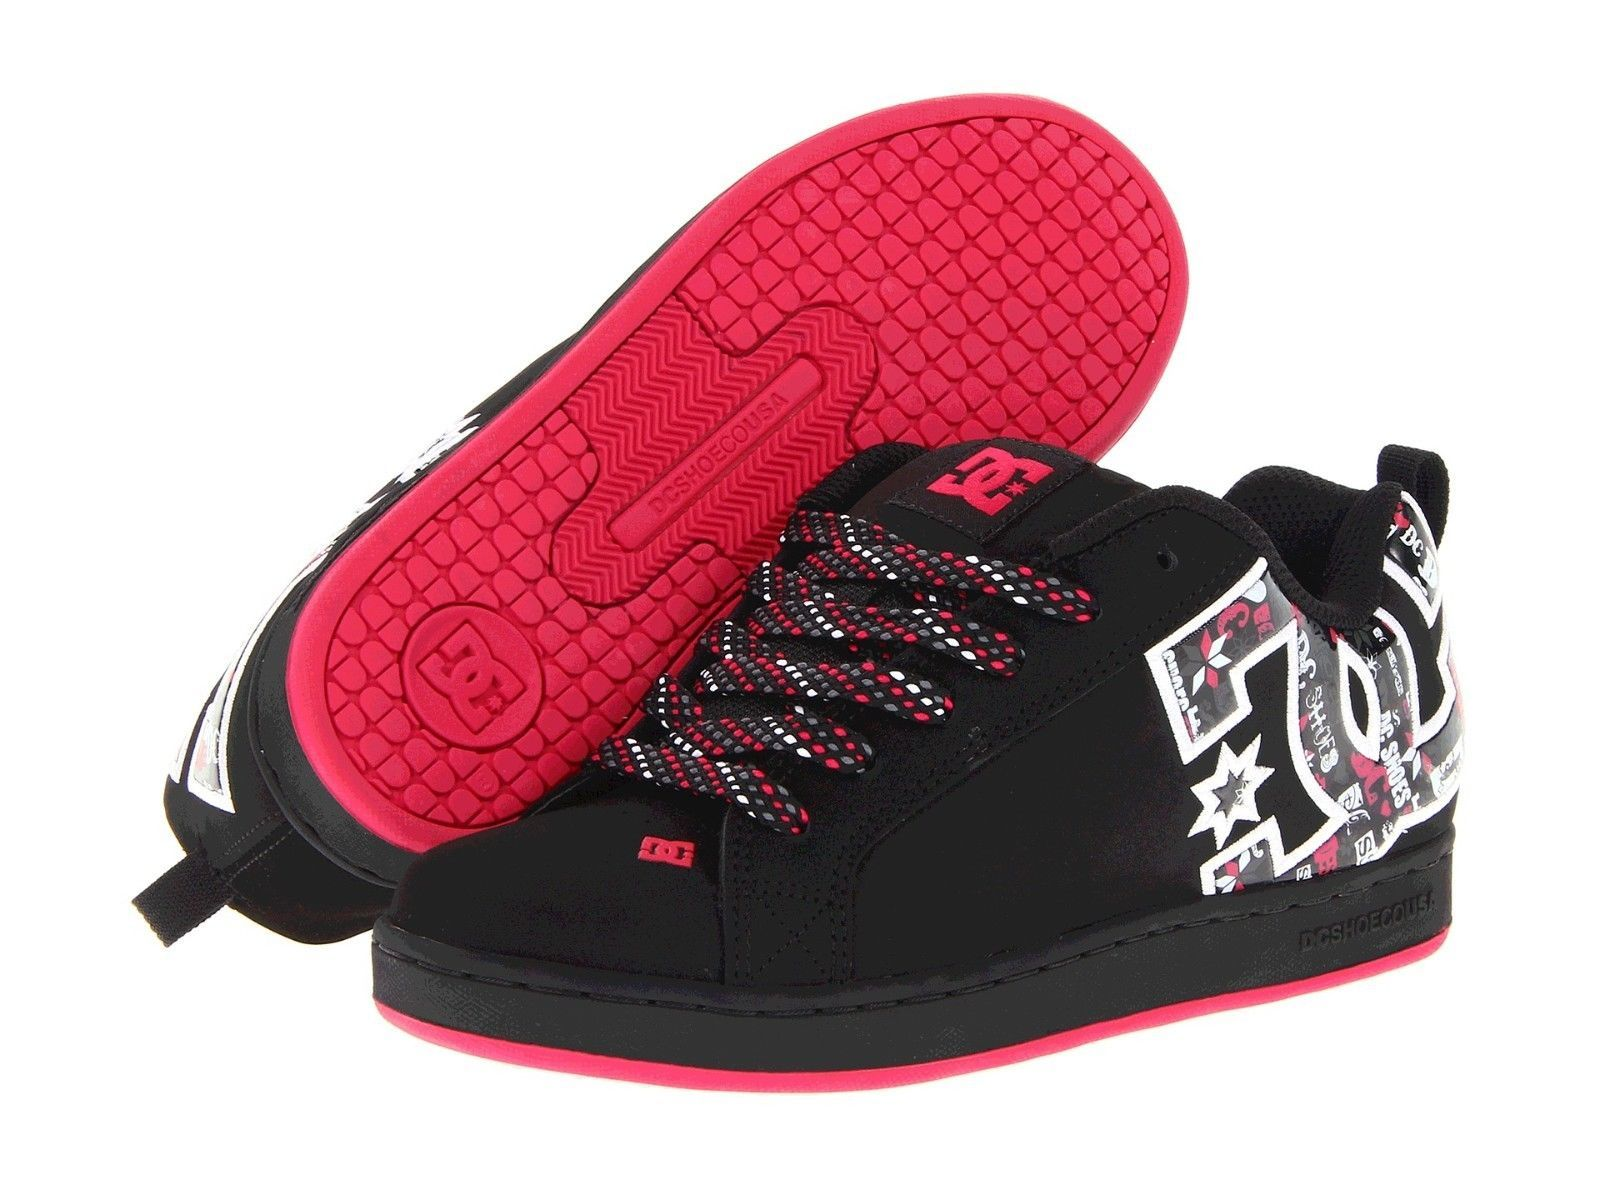 Skate shoes size 9 - Dc Womens Girls Graffik Se Skateboarding Shoes Bmx Black Red Size 9